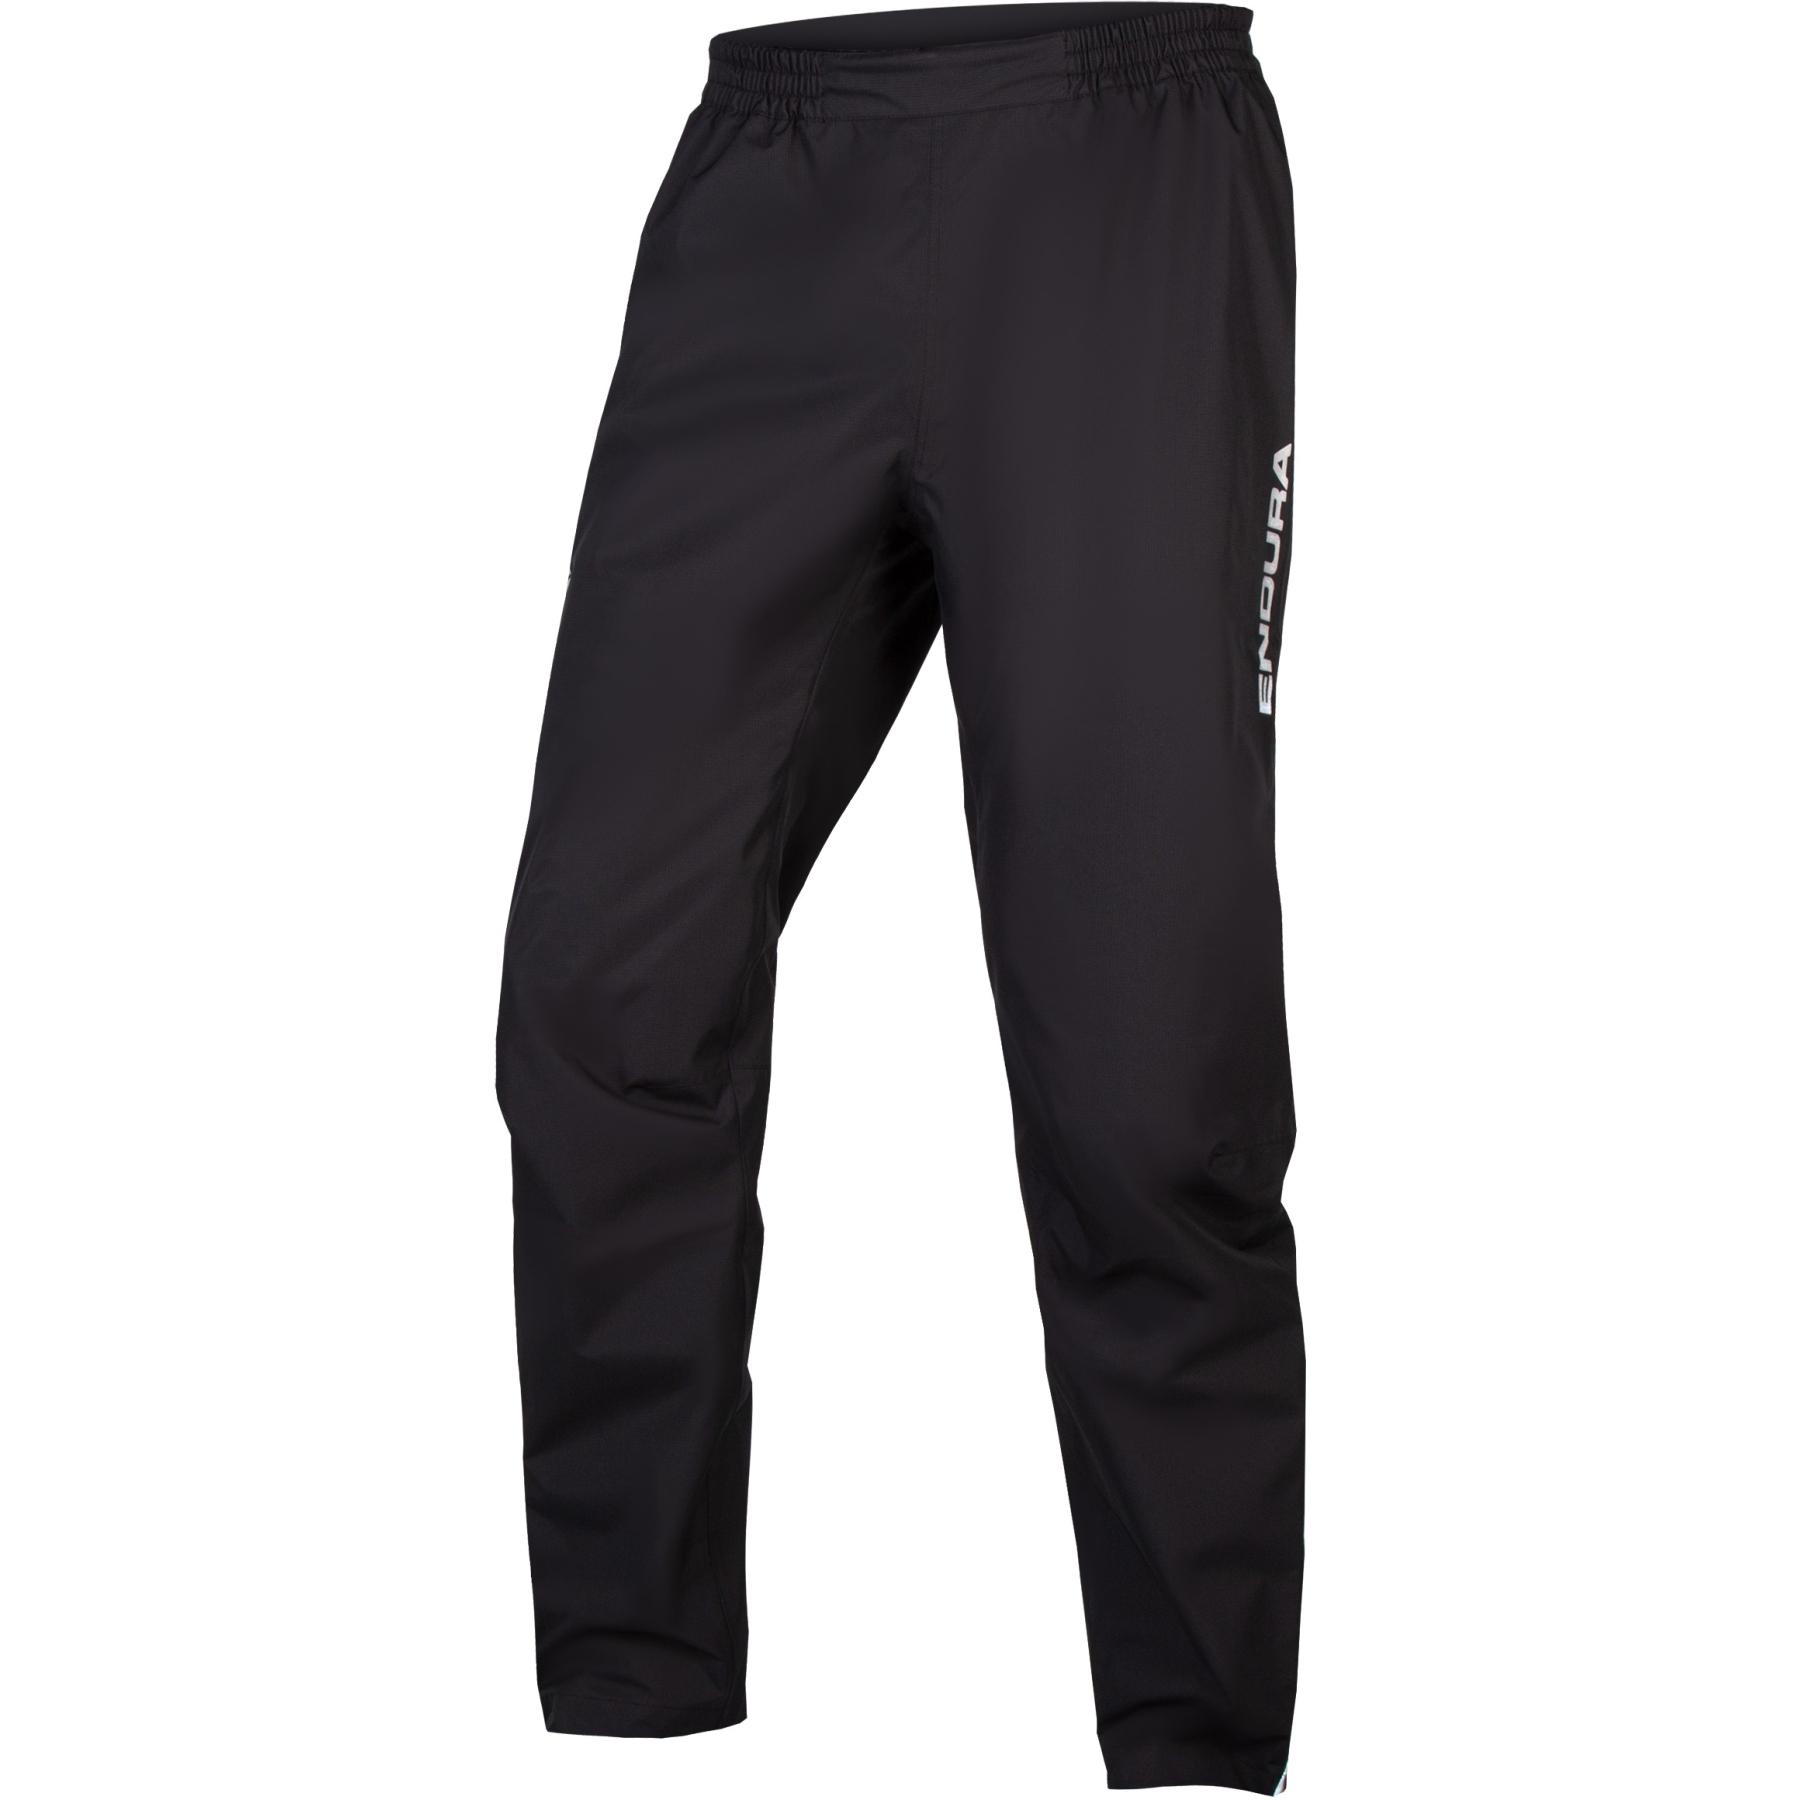 Foto de Endura Hummvee Transit Pantalones Impermeables - black